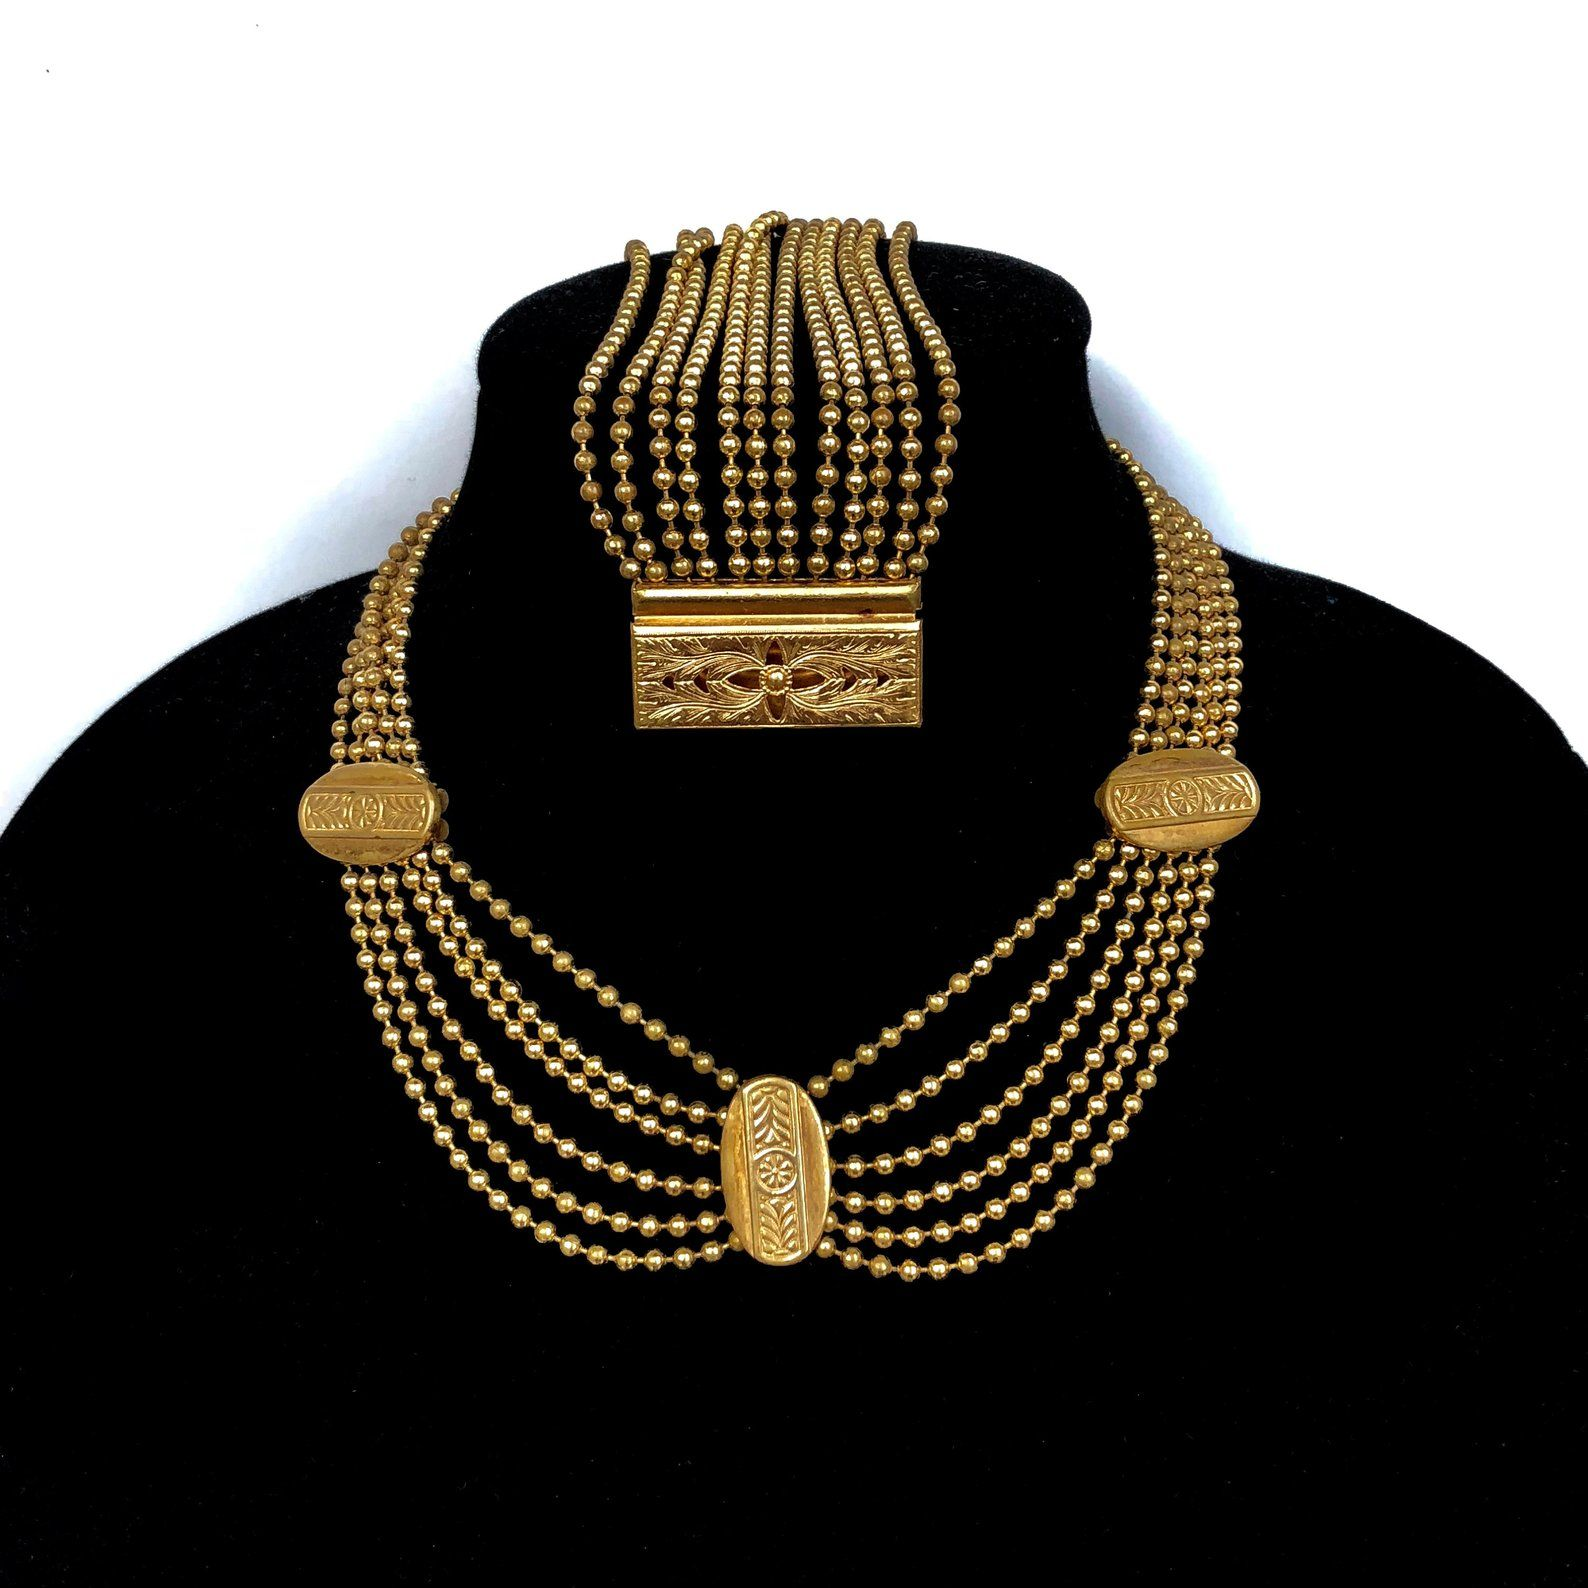 ART DECO ball chain Festoon Necklace Gold 1930s